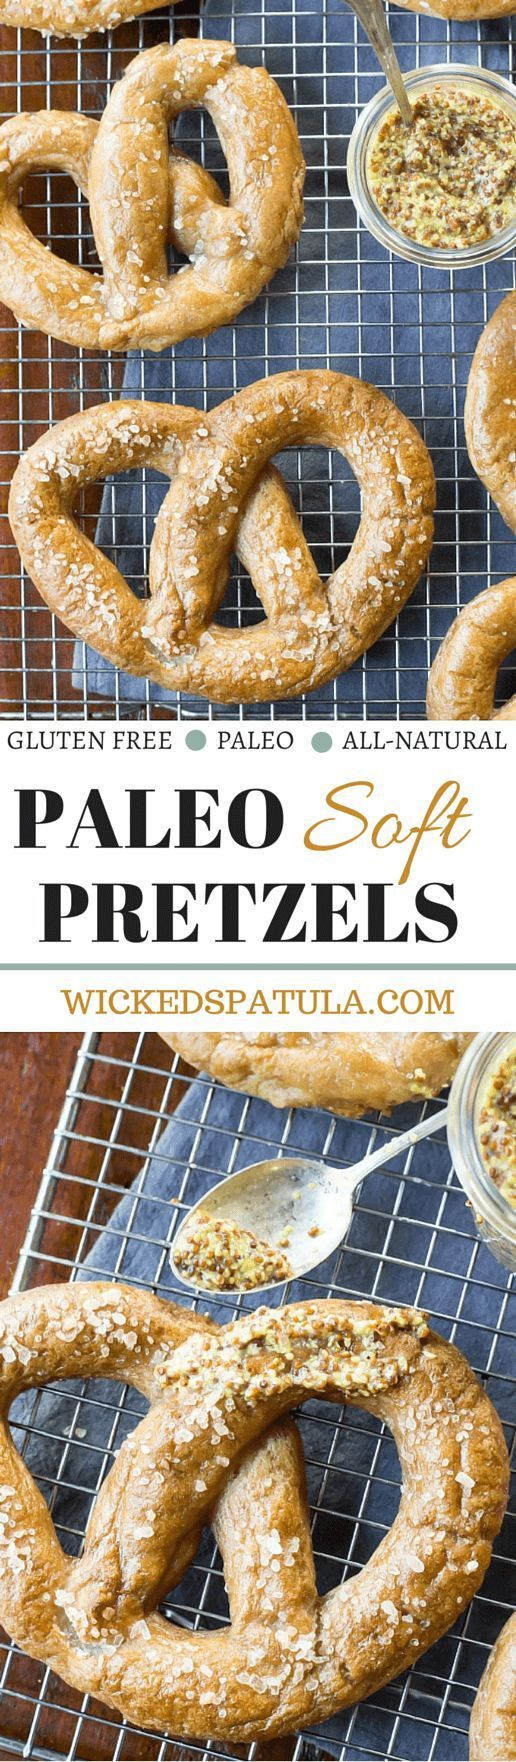 Paleo Pretzels - Just like Auntie Ann's!: